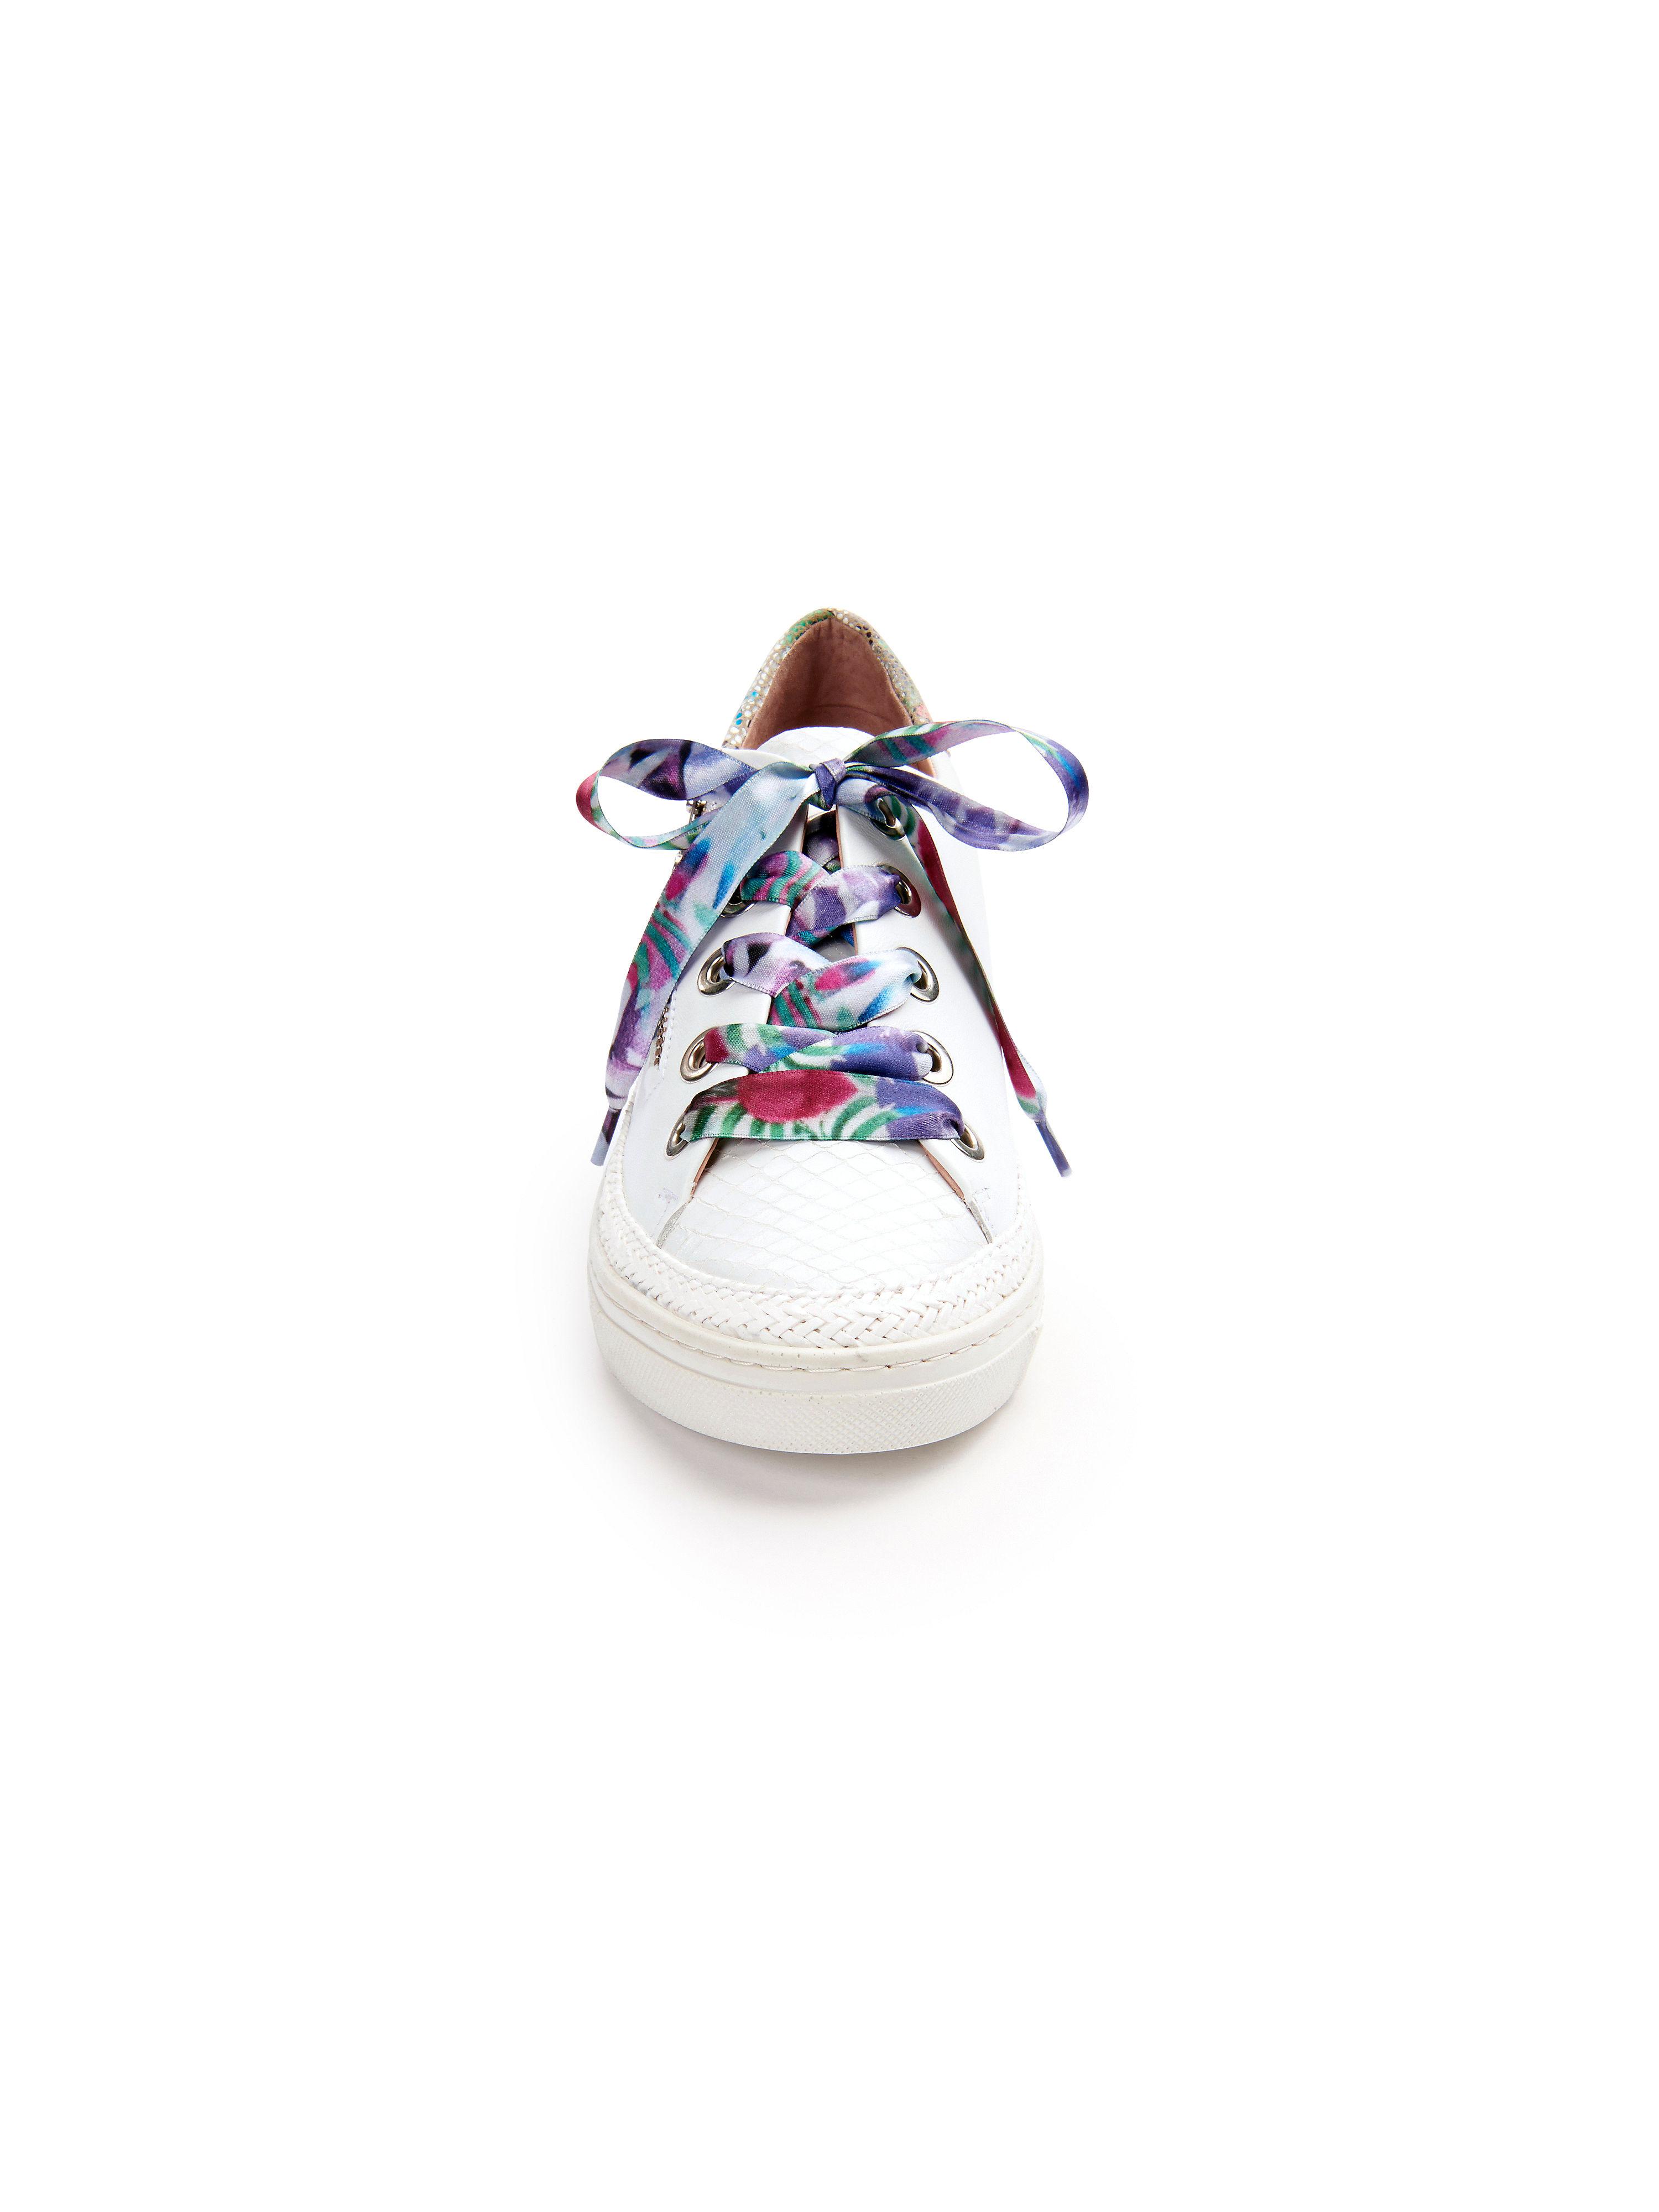 "Softwaves - leichter Qualität Sneaker ""Light Softy's"" - Weiß/Multicolor Gute Qualität leichter beliebte Schuhe 8b6bae"